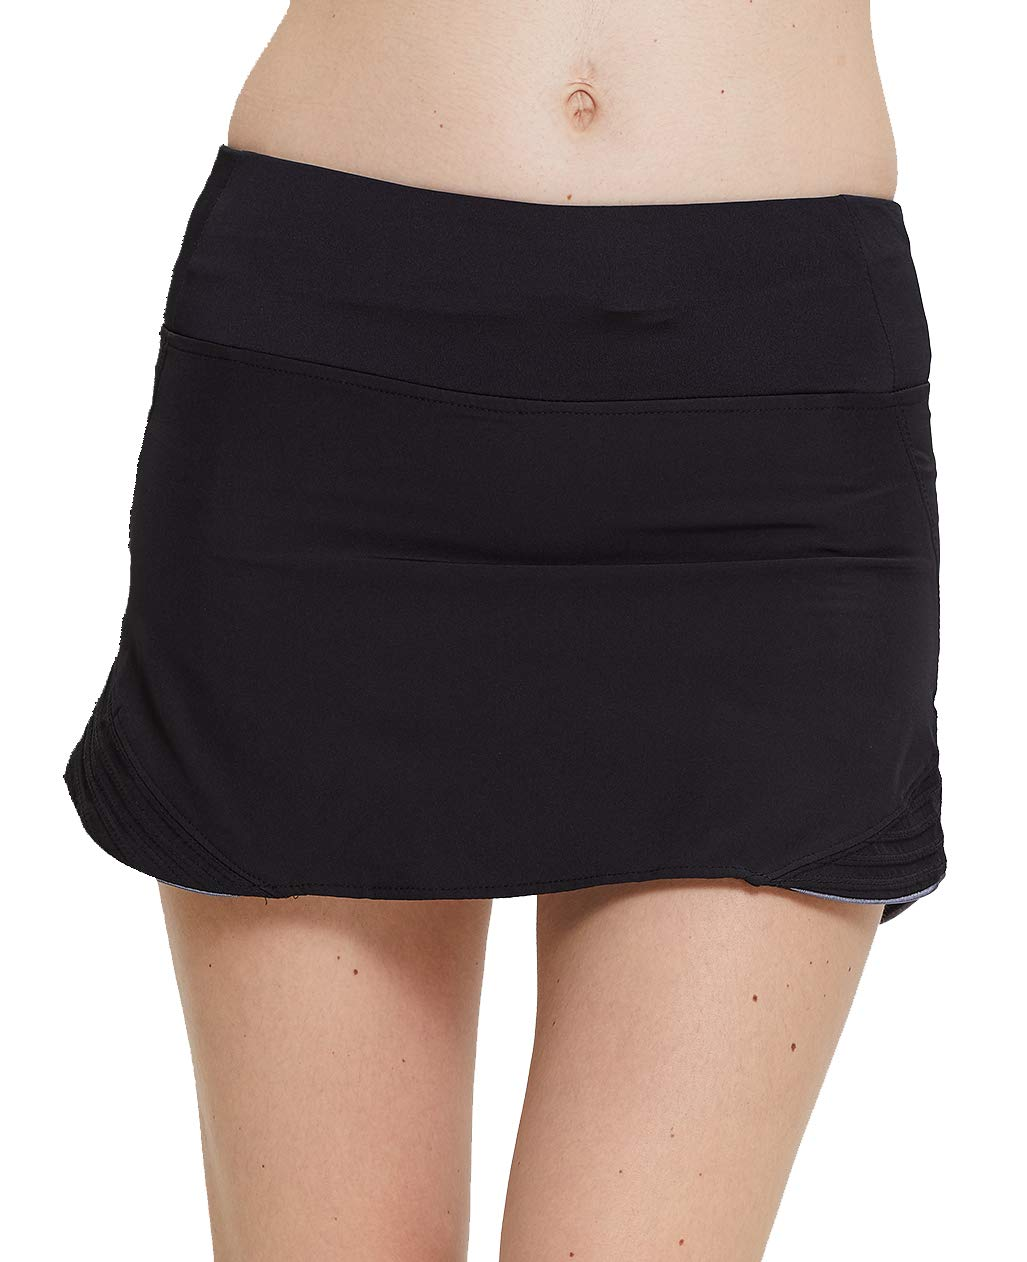 UDIY Women's Workout Active Skorts Sports Tennis Golf Skirt Built-in Shorts Lightweight Gym Stretchy Skorts for Girls, Black